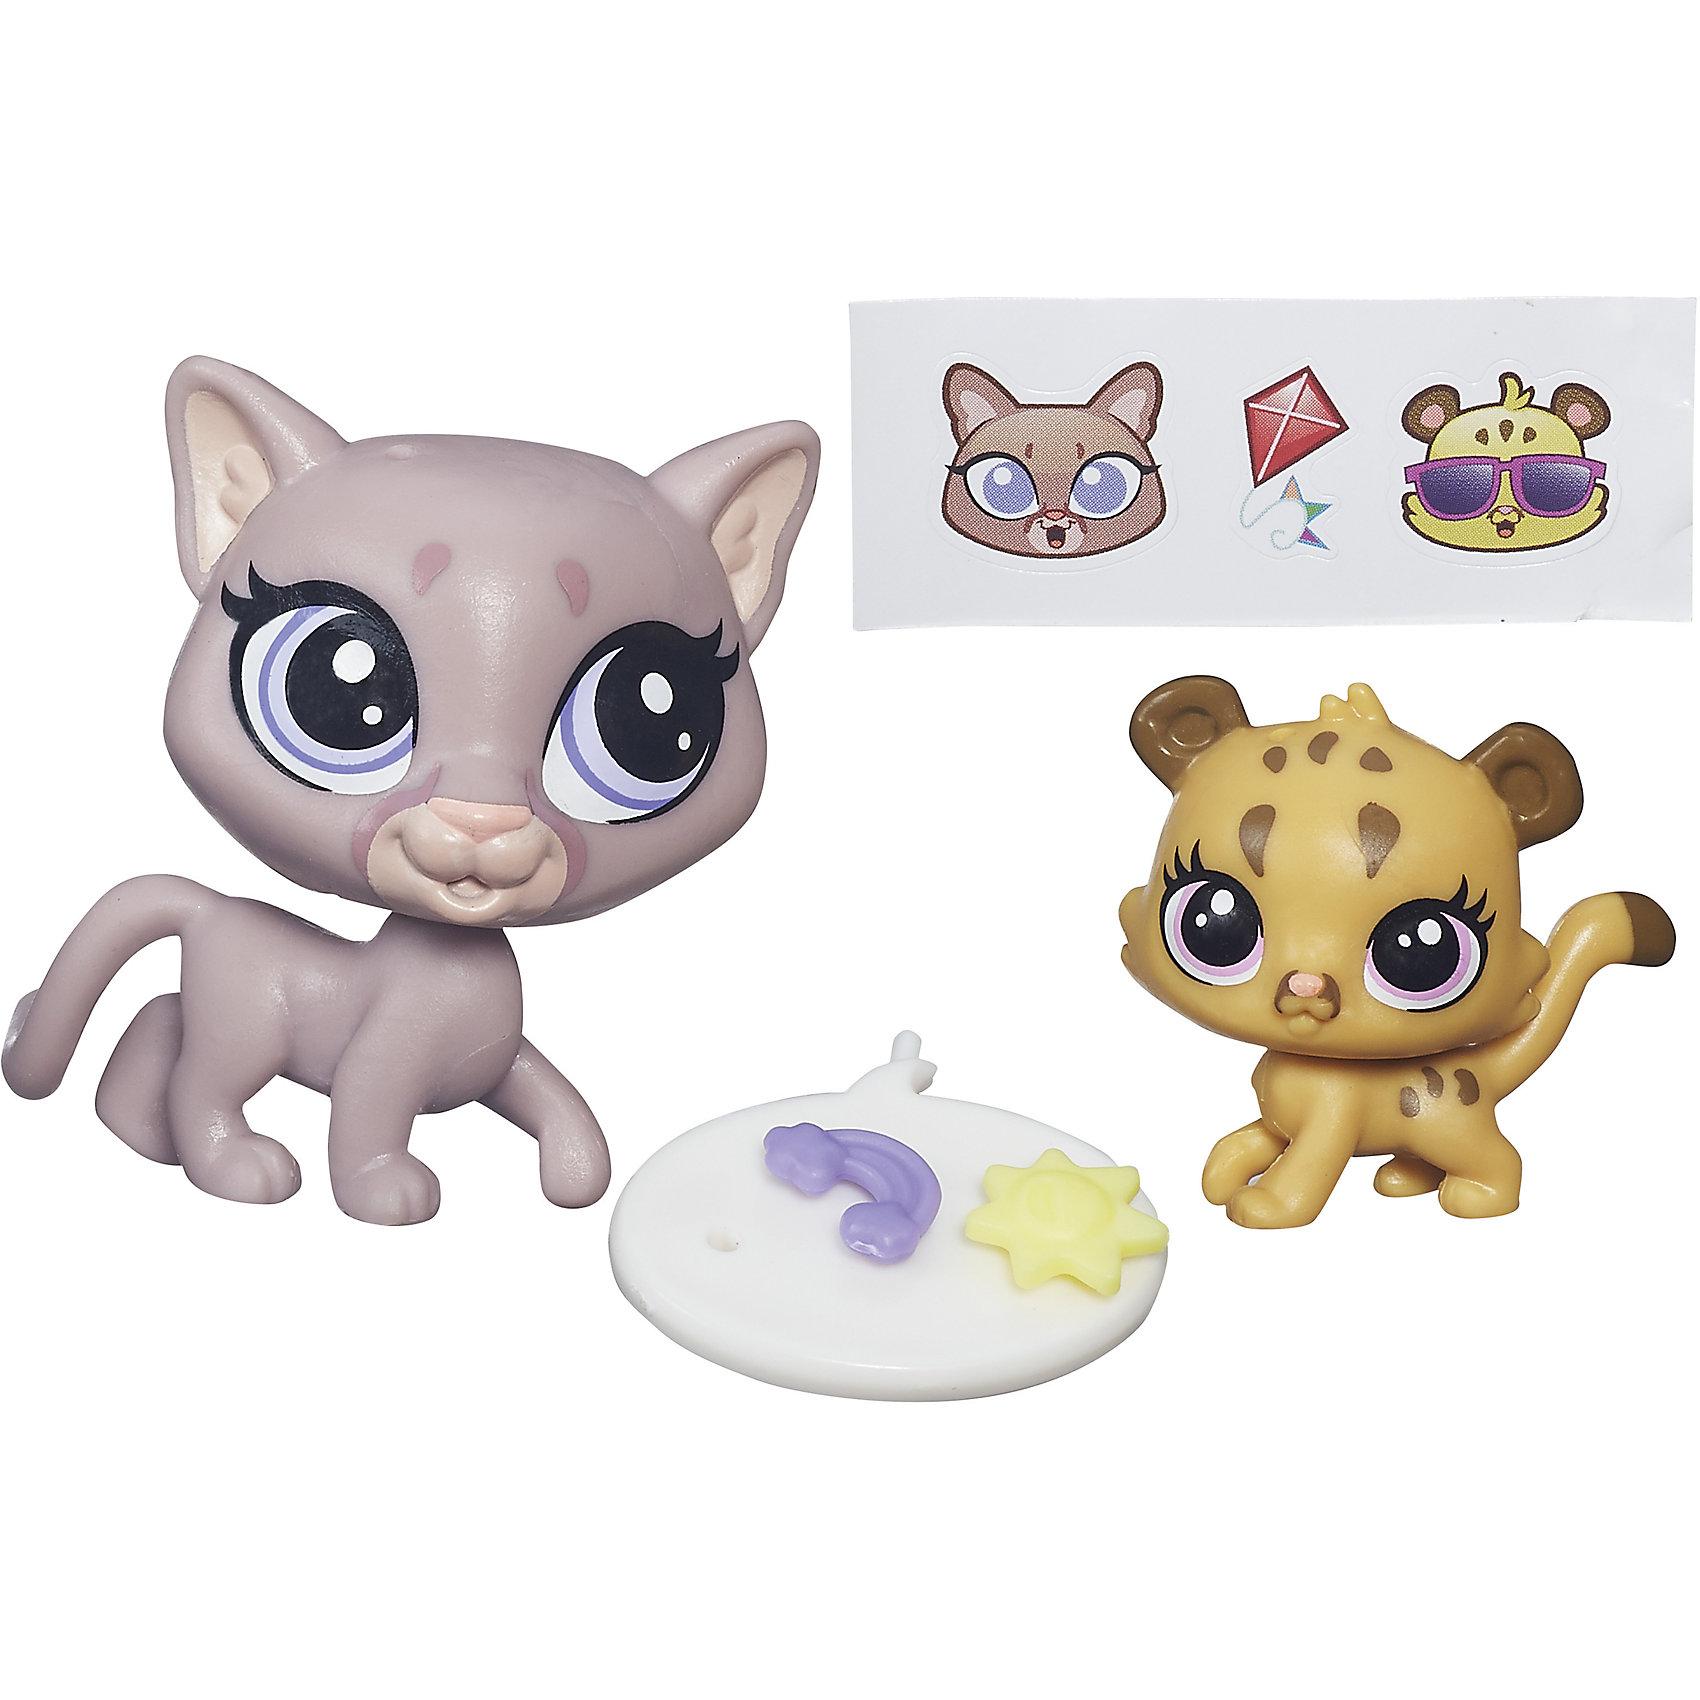 Hasbro Зверюшка и ее малыш, Littlest Pet Shop, А7313/B4761 фигурка littlest pet shop зверюшка в закрытой упаковке 5 см в ассортименте